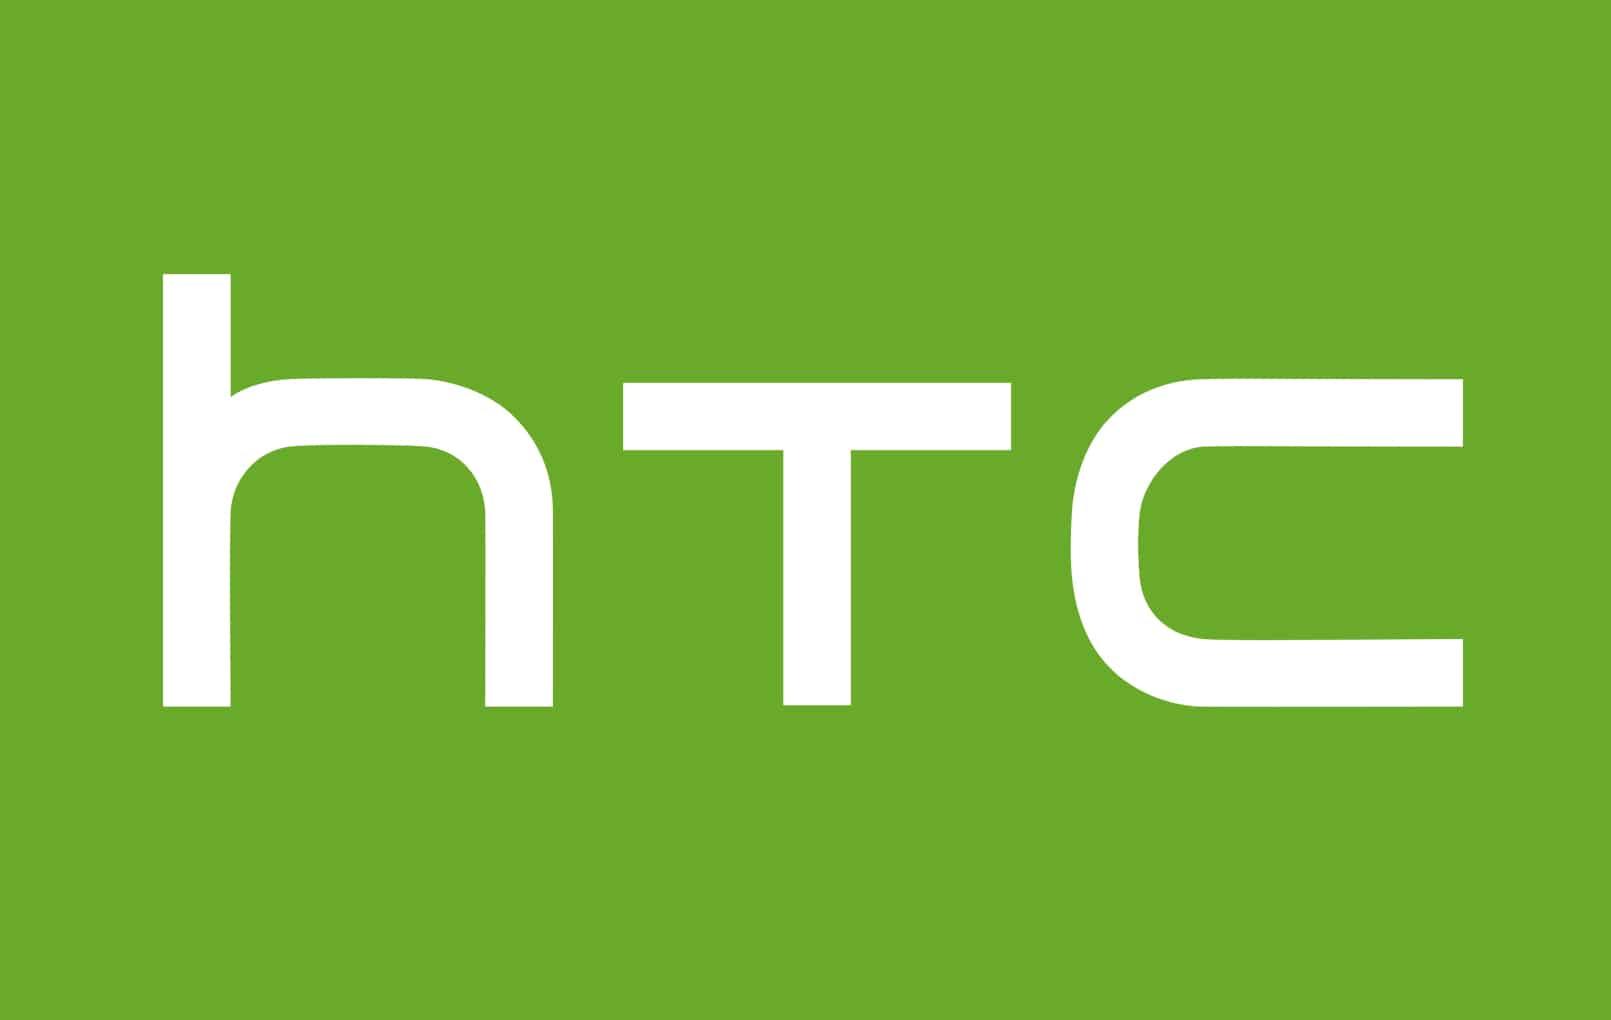 Deal: HTC U Ultra 64 GB nur 249 Euro bei MediaMarkt 24 techboys.de • smarte News, auf den Punkt! Deal: HTC U Ultra 64 GB nur 249 Euro bei MediaMarkt